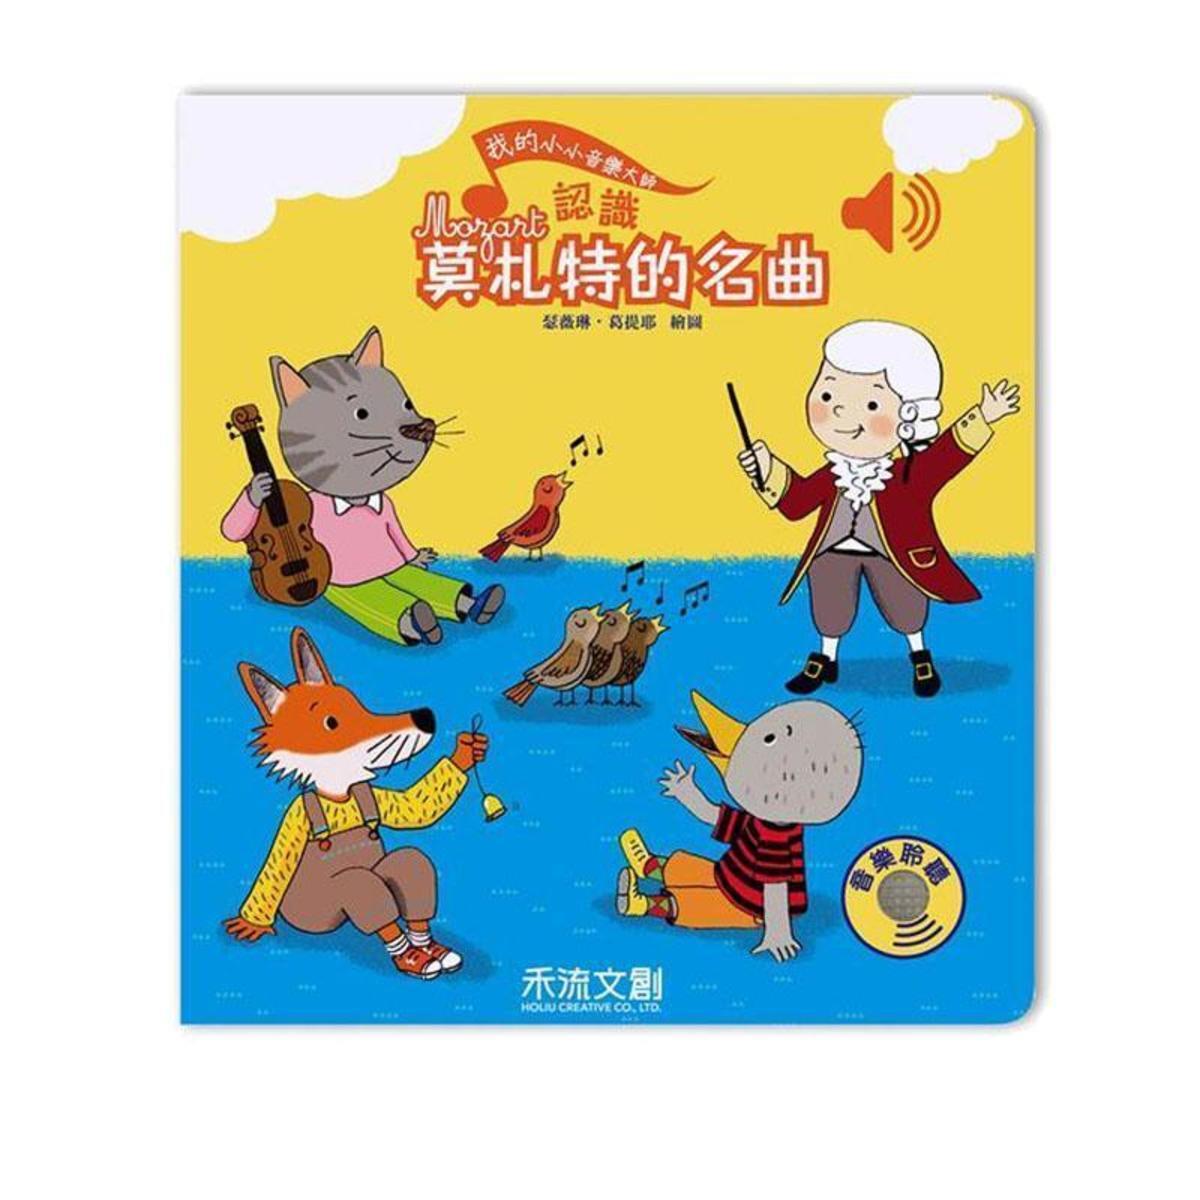 Publishing Meet Mozart's Famous Songs Taiwan Import